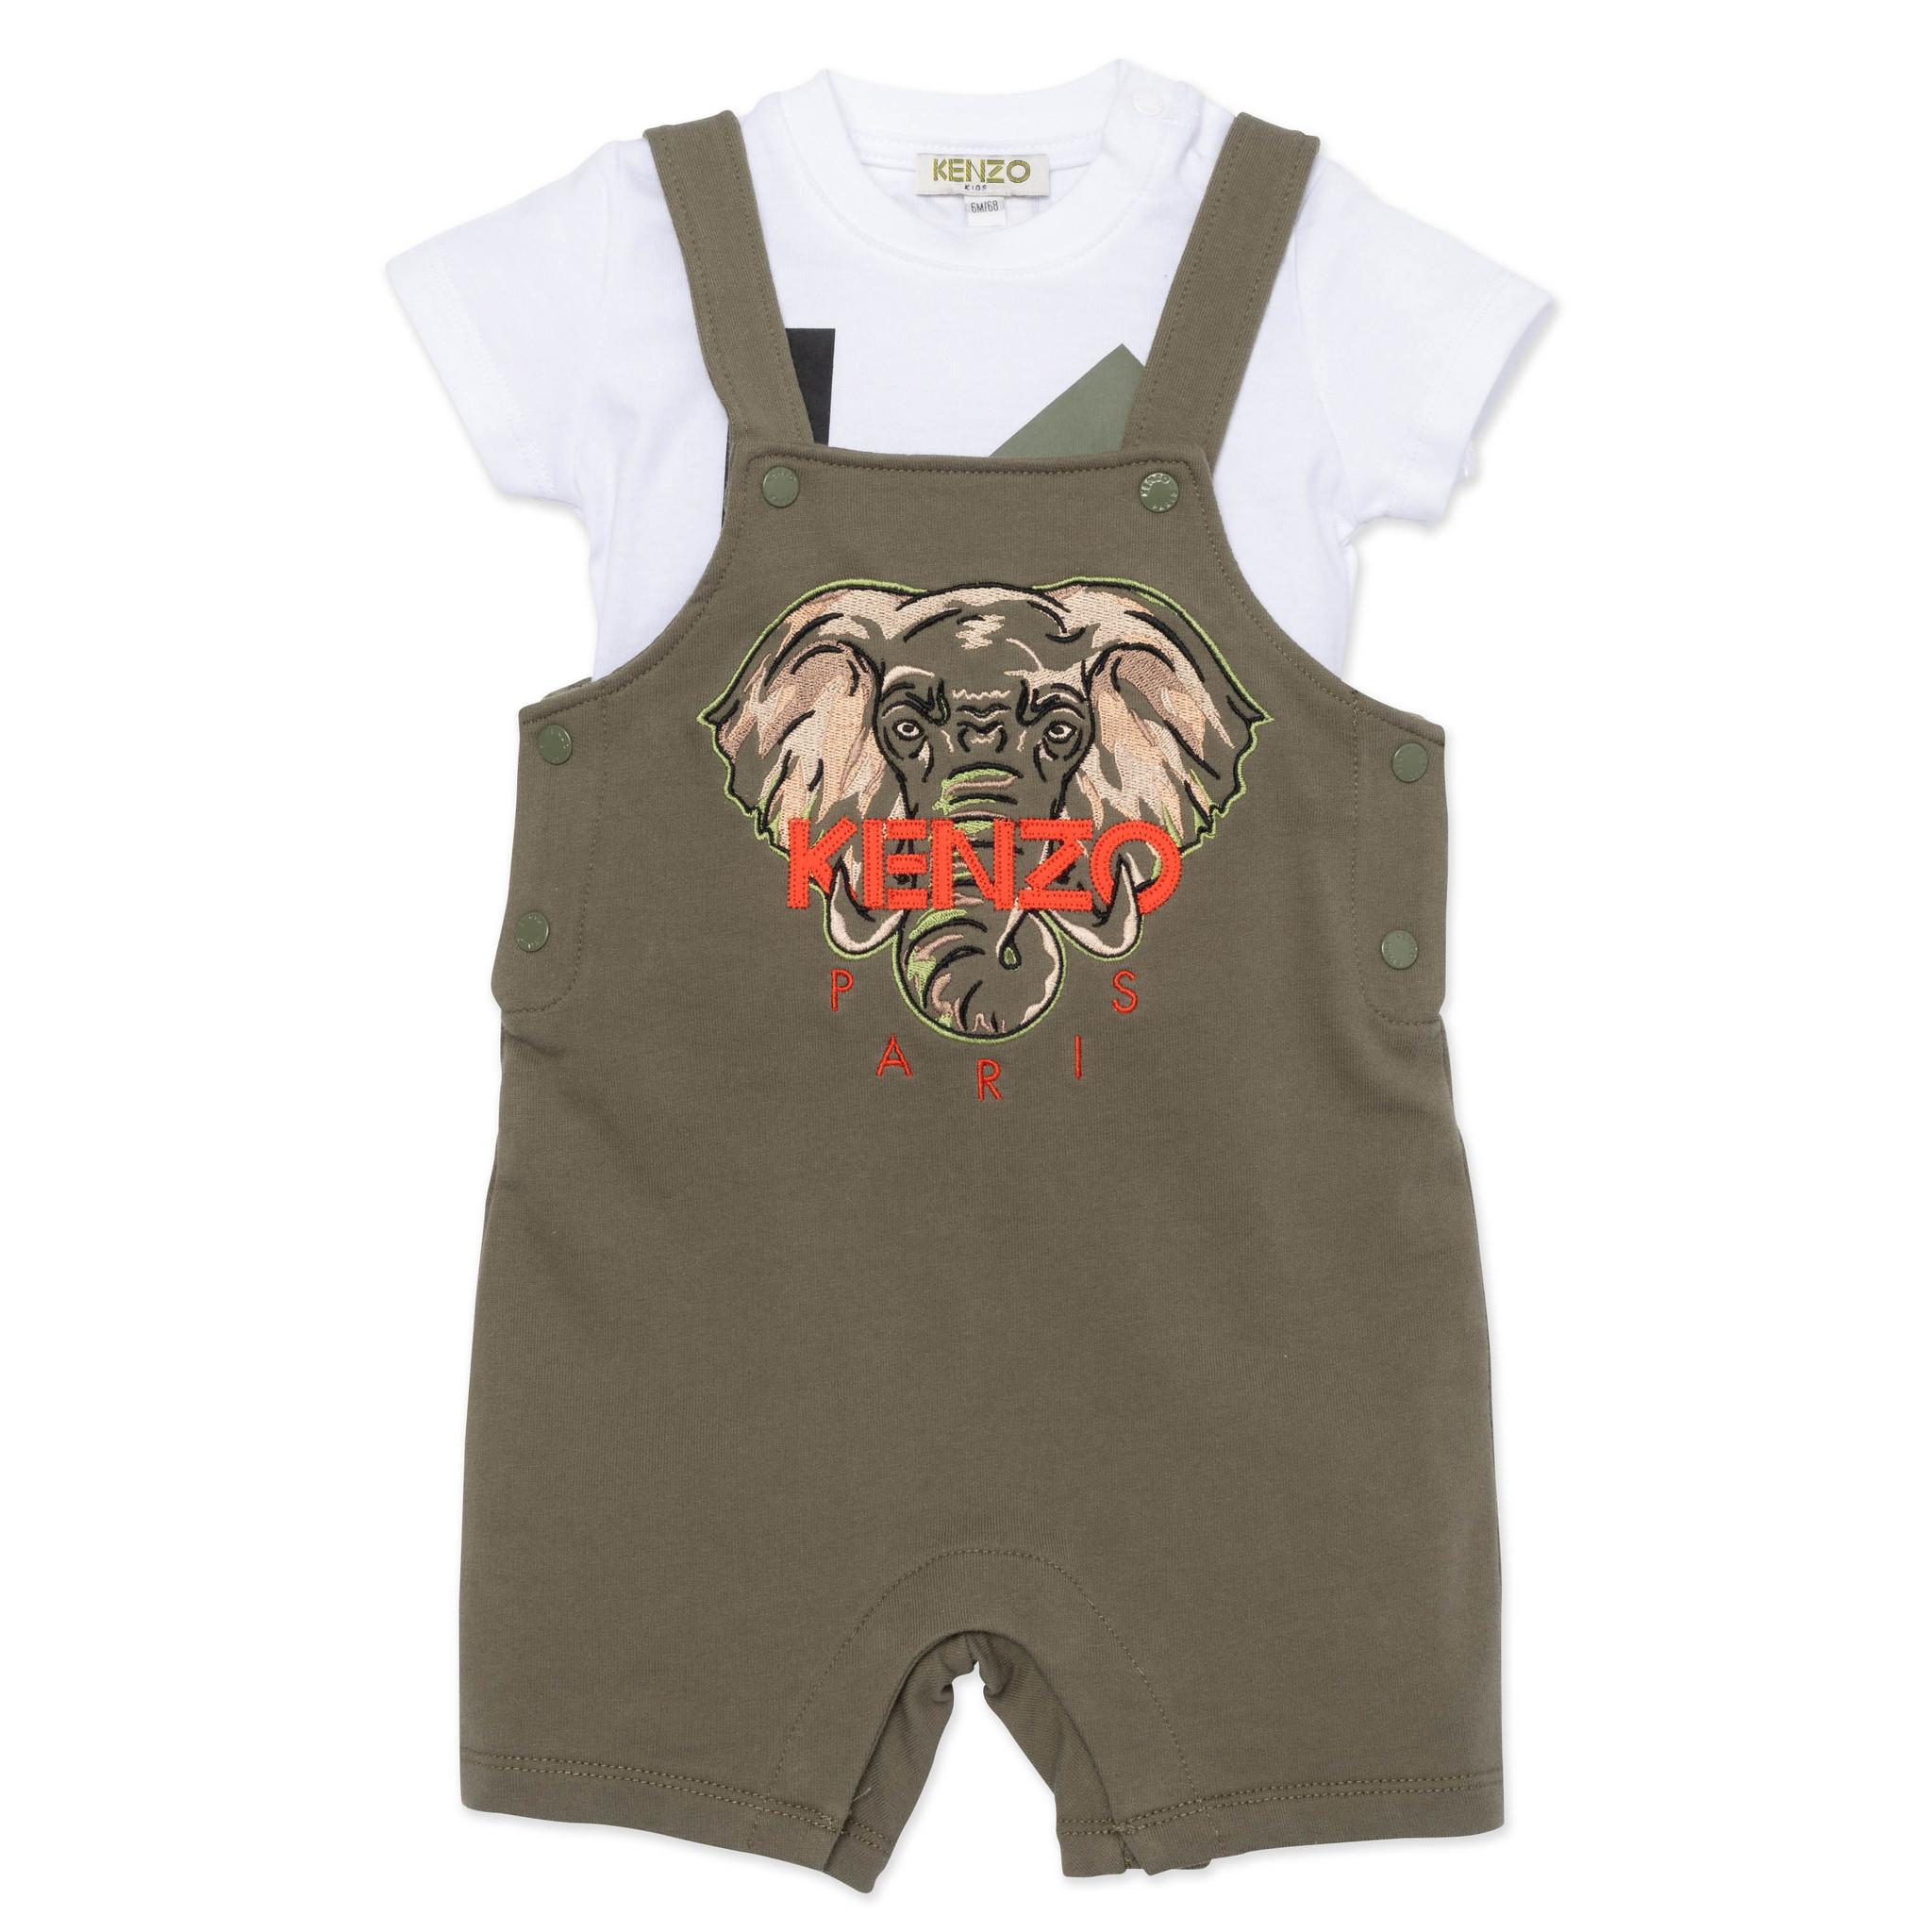 KENZO KIDS ensemble t shirt et salopette-2